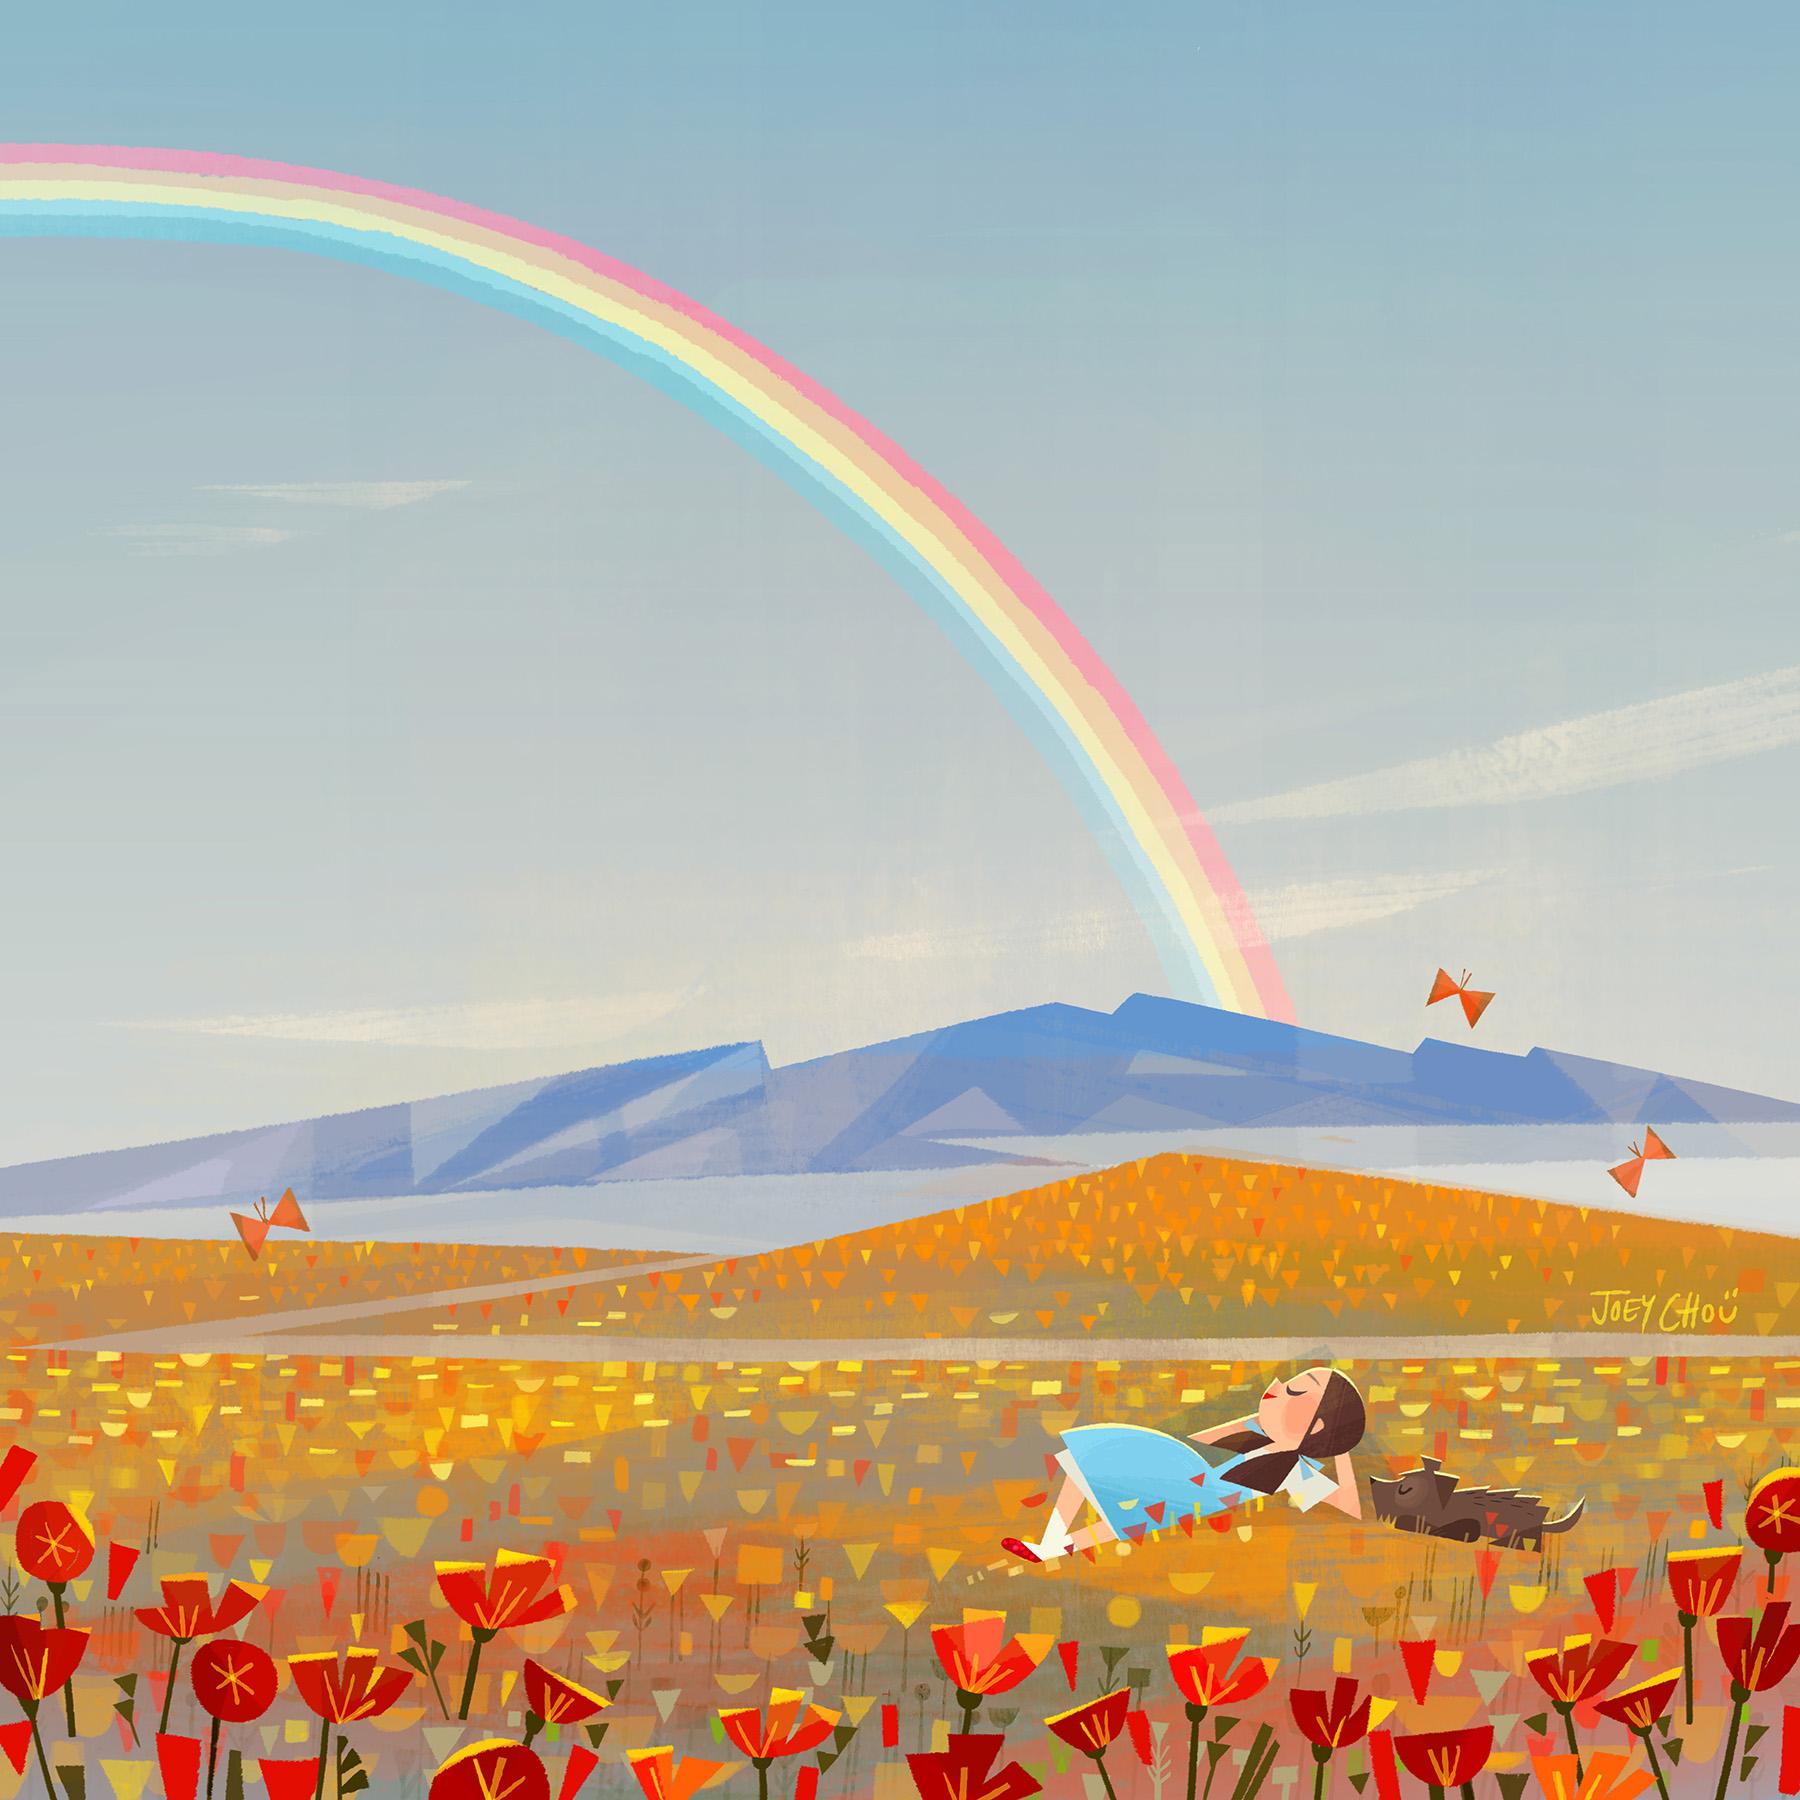 somewhere_over_the_rainbow_poppy.jpg